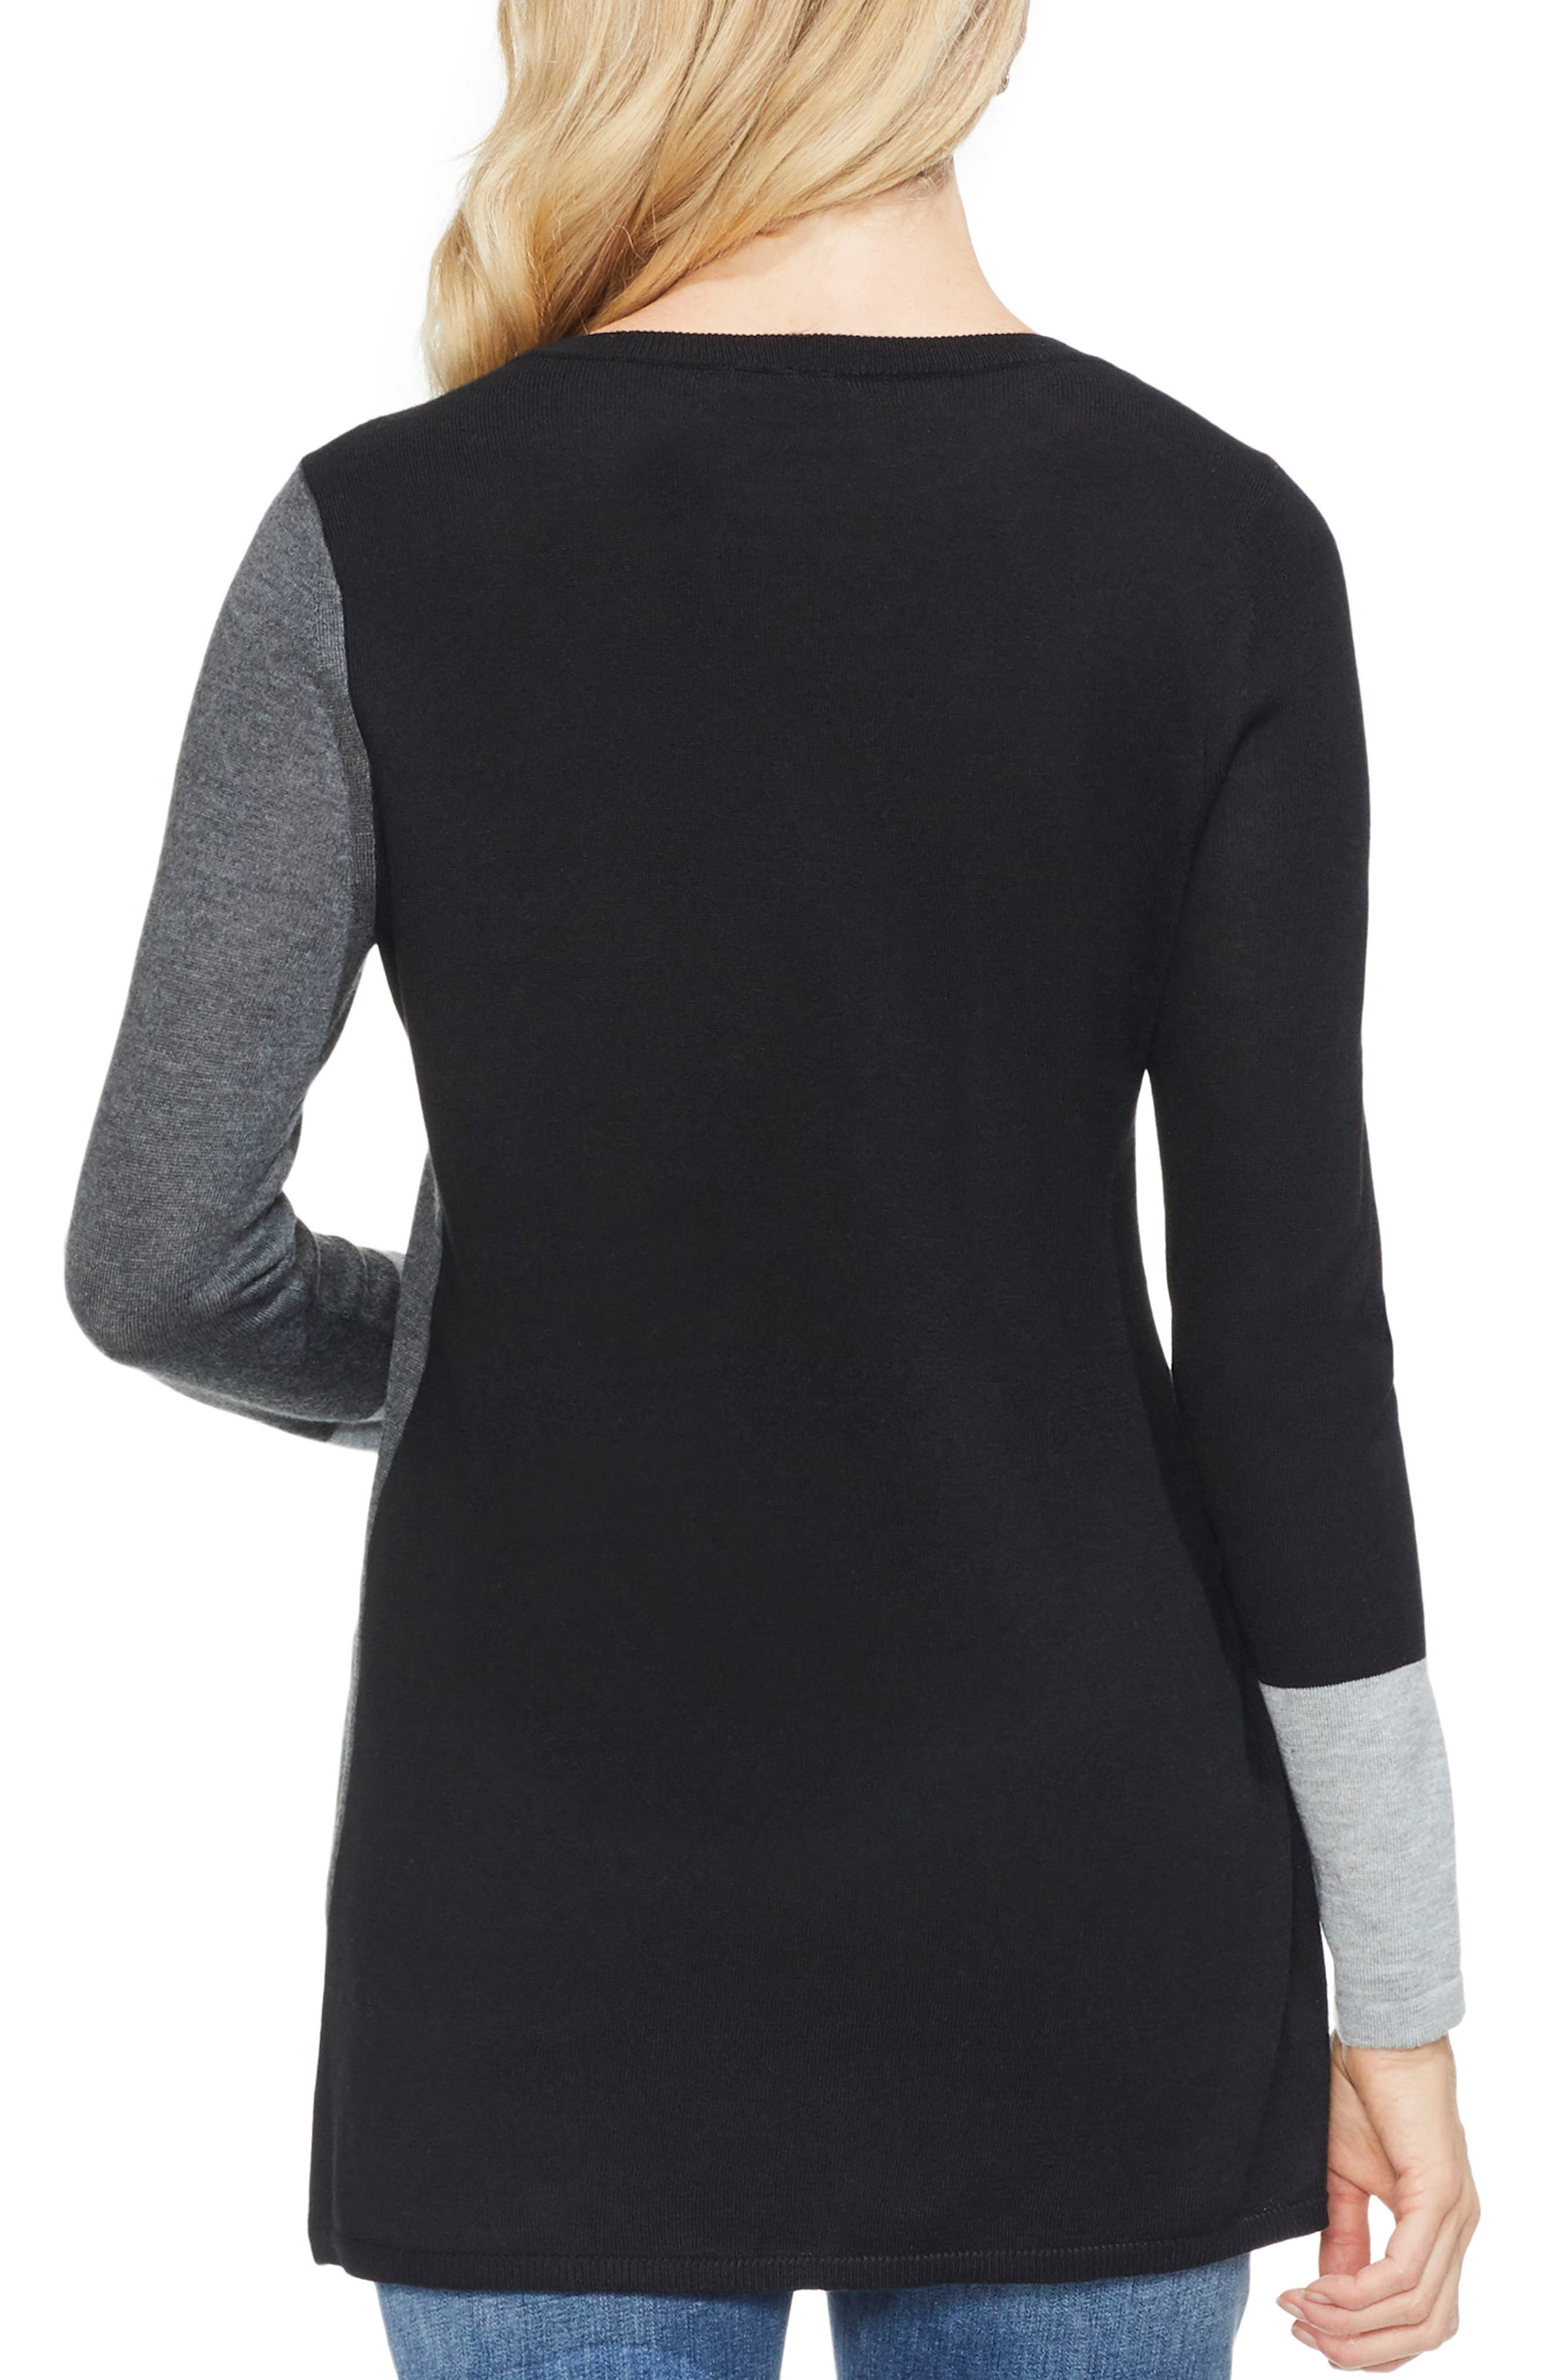 Colorblock Sweater,                             Alternate thumbnail 2, color,                             023